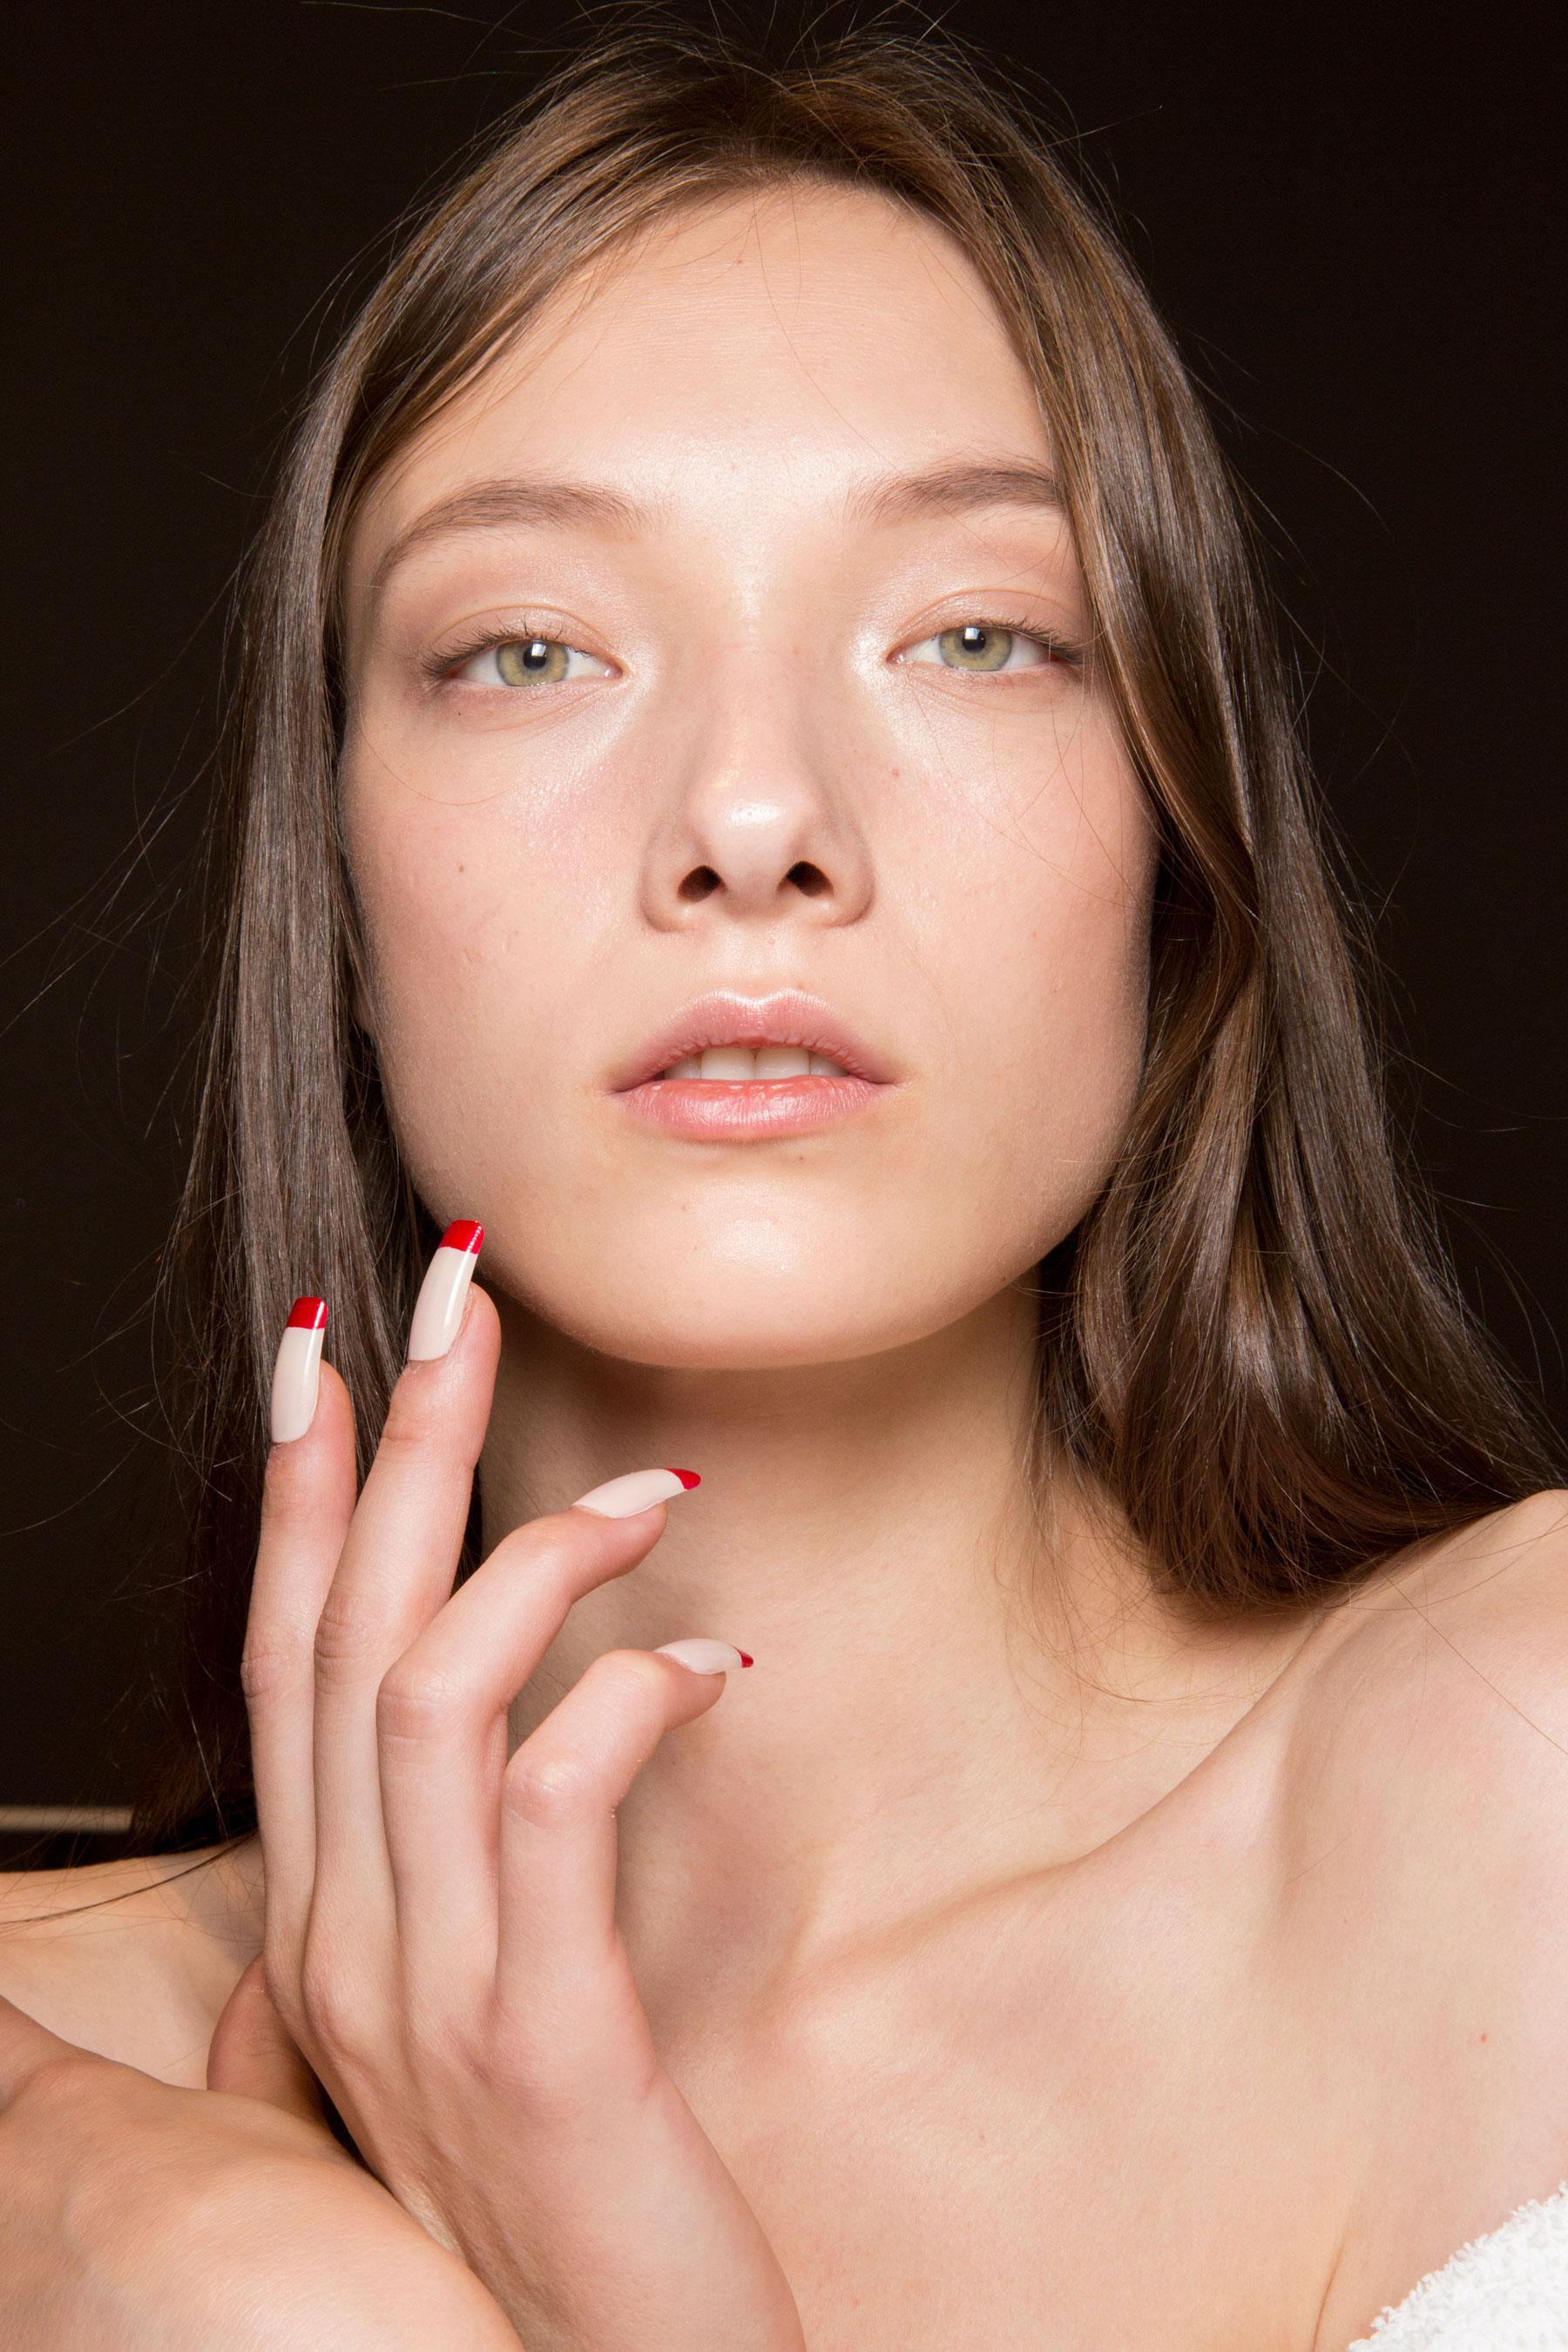 Gucci0-backsatge-beauty-spring-2016-fashion-show-the-impression-040